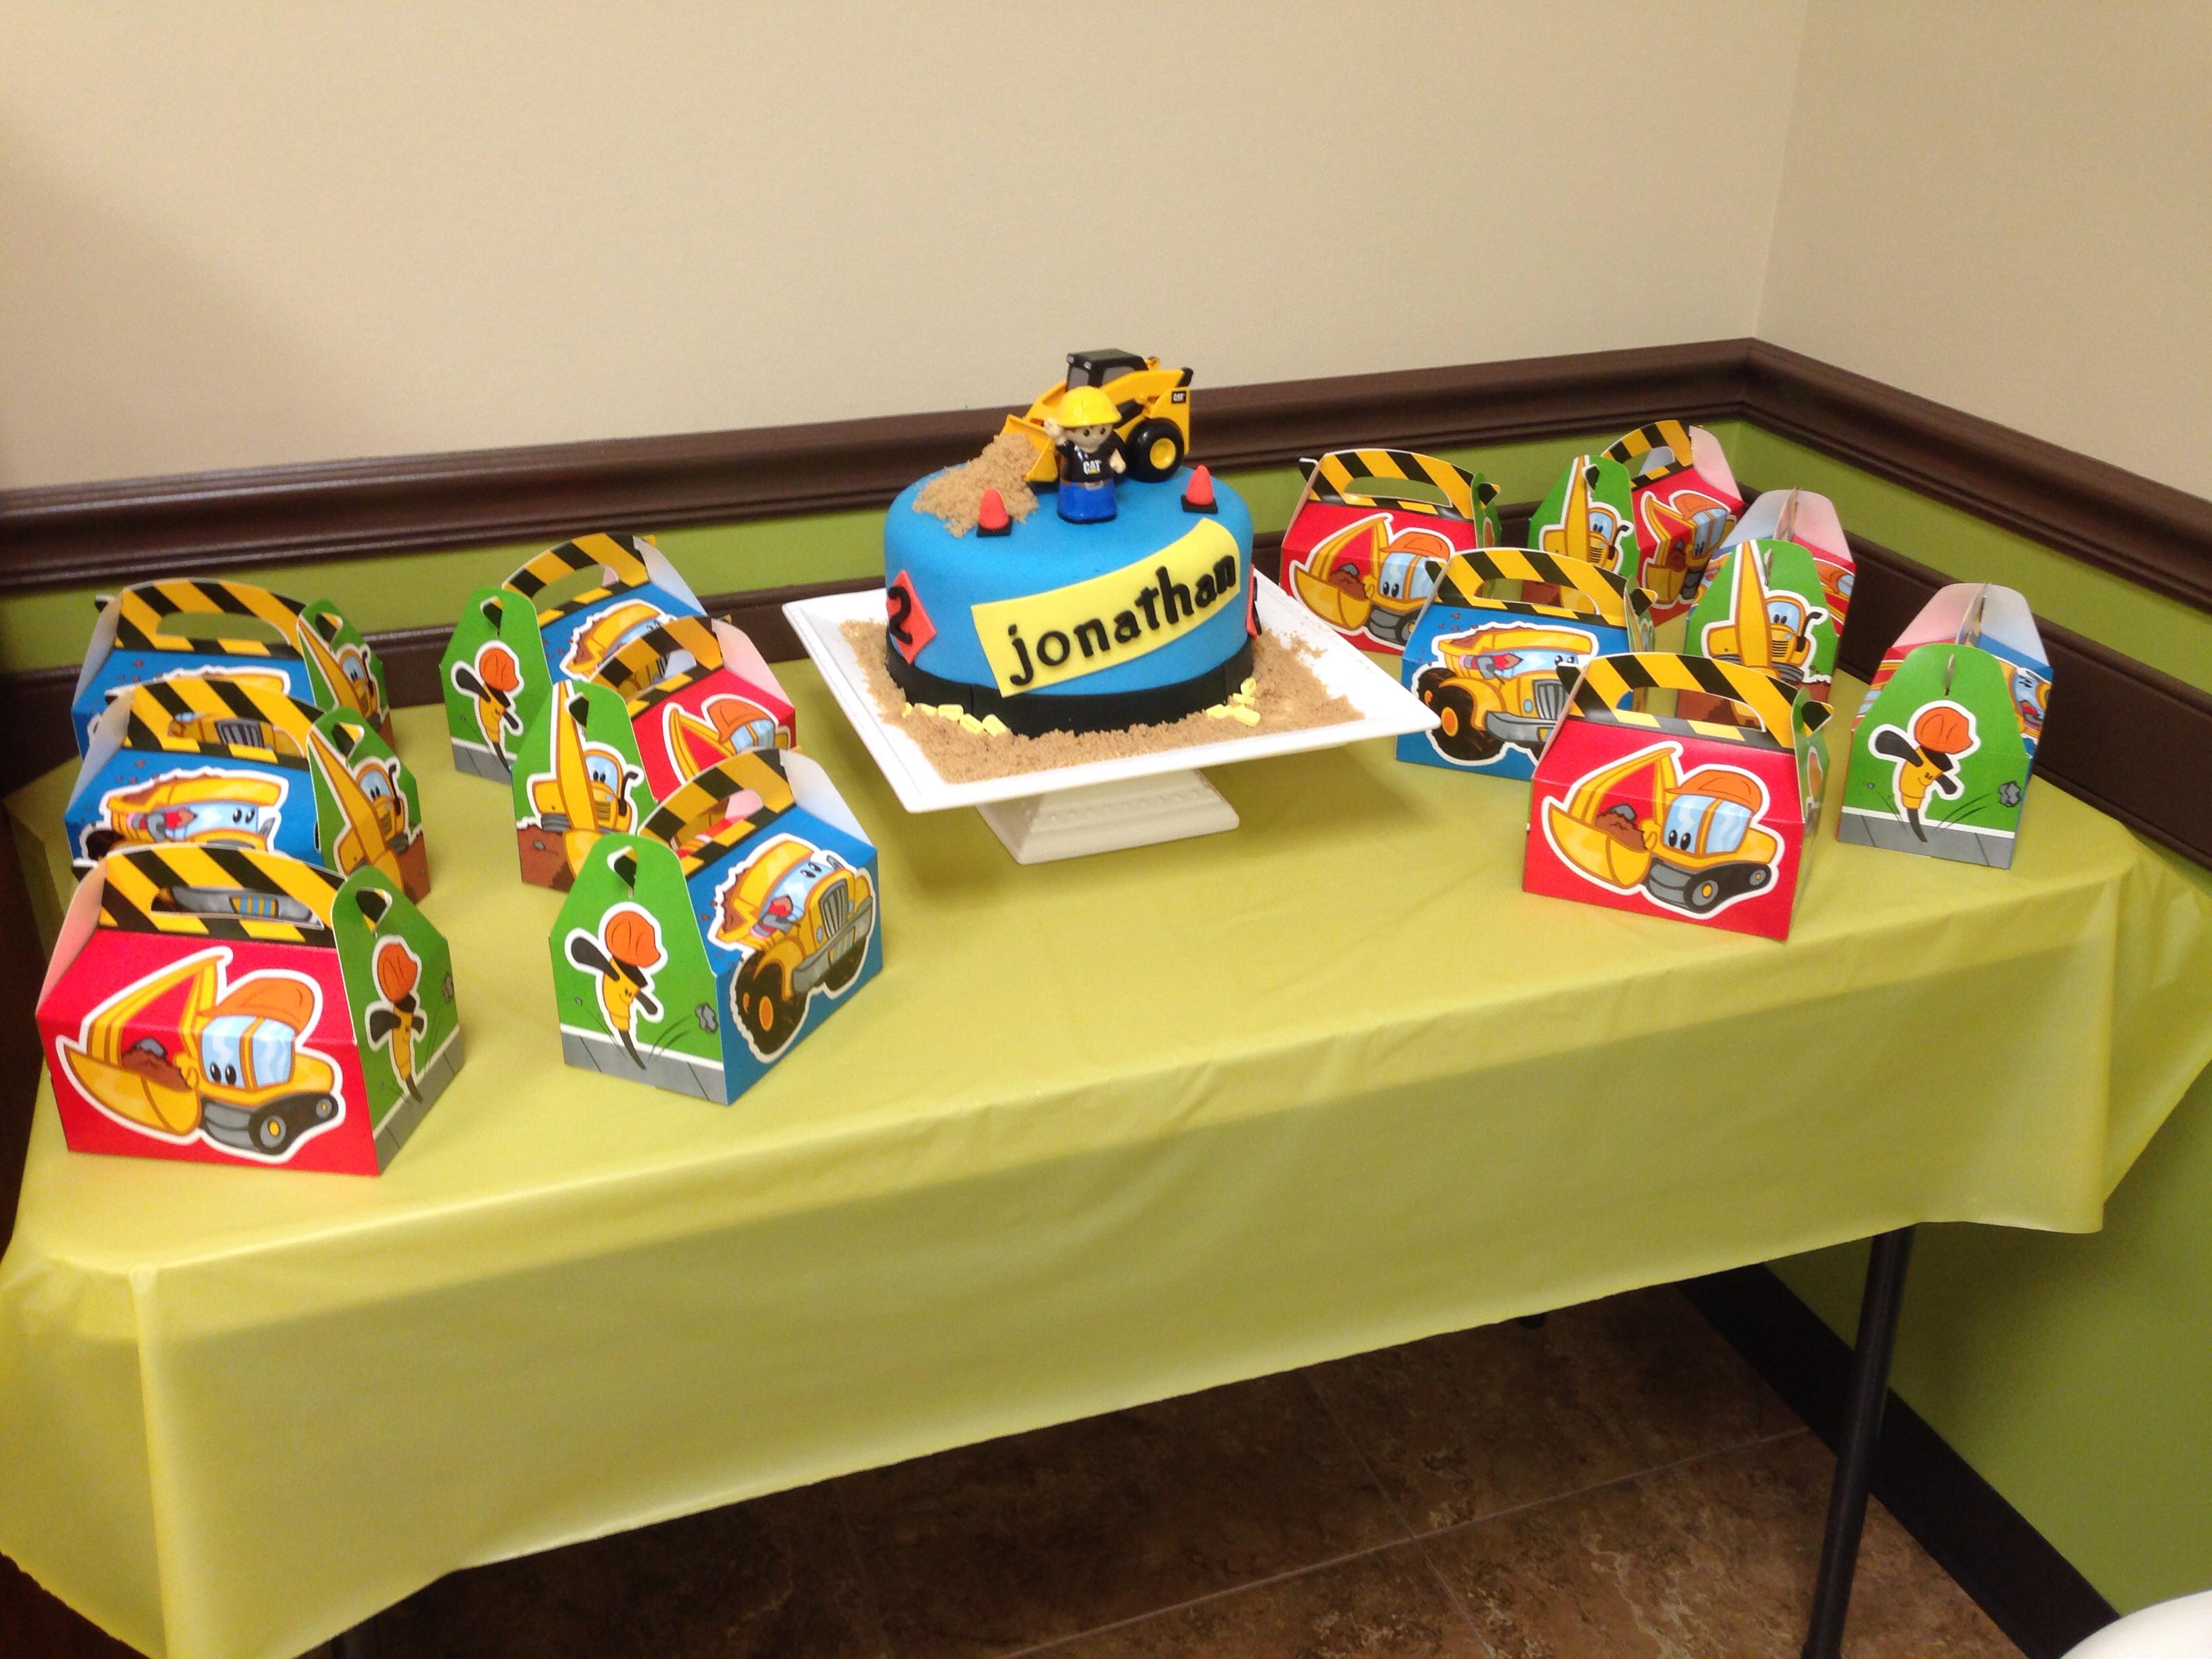 Swell 10 Tonka Truck Birthday Party Cupcakes Photo Tonka Truck Funny Birthday Cards Online Necthendildamsfinfo